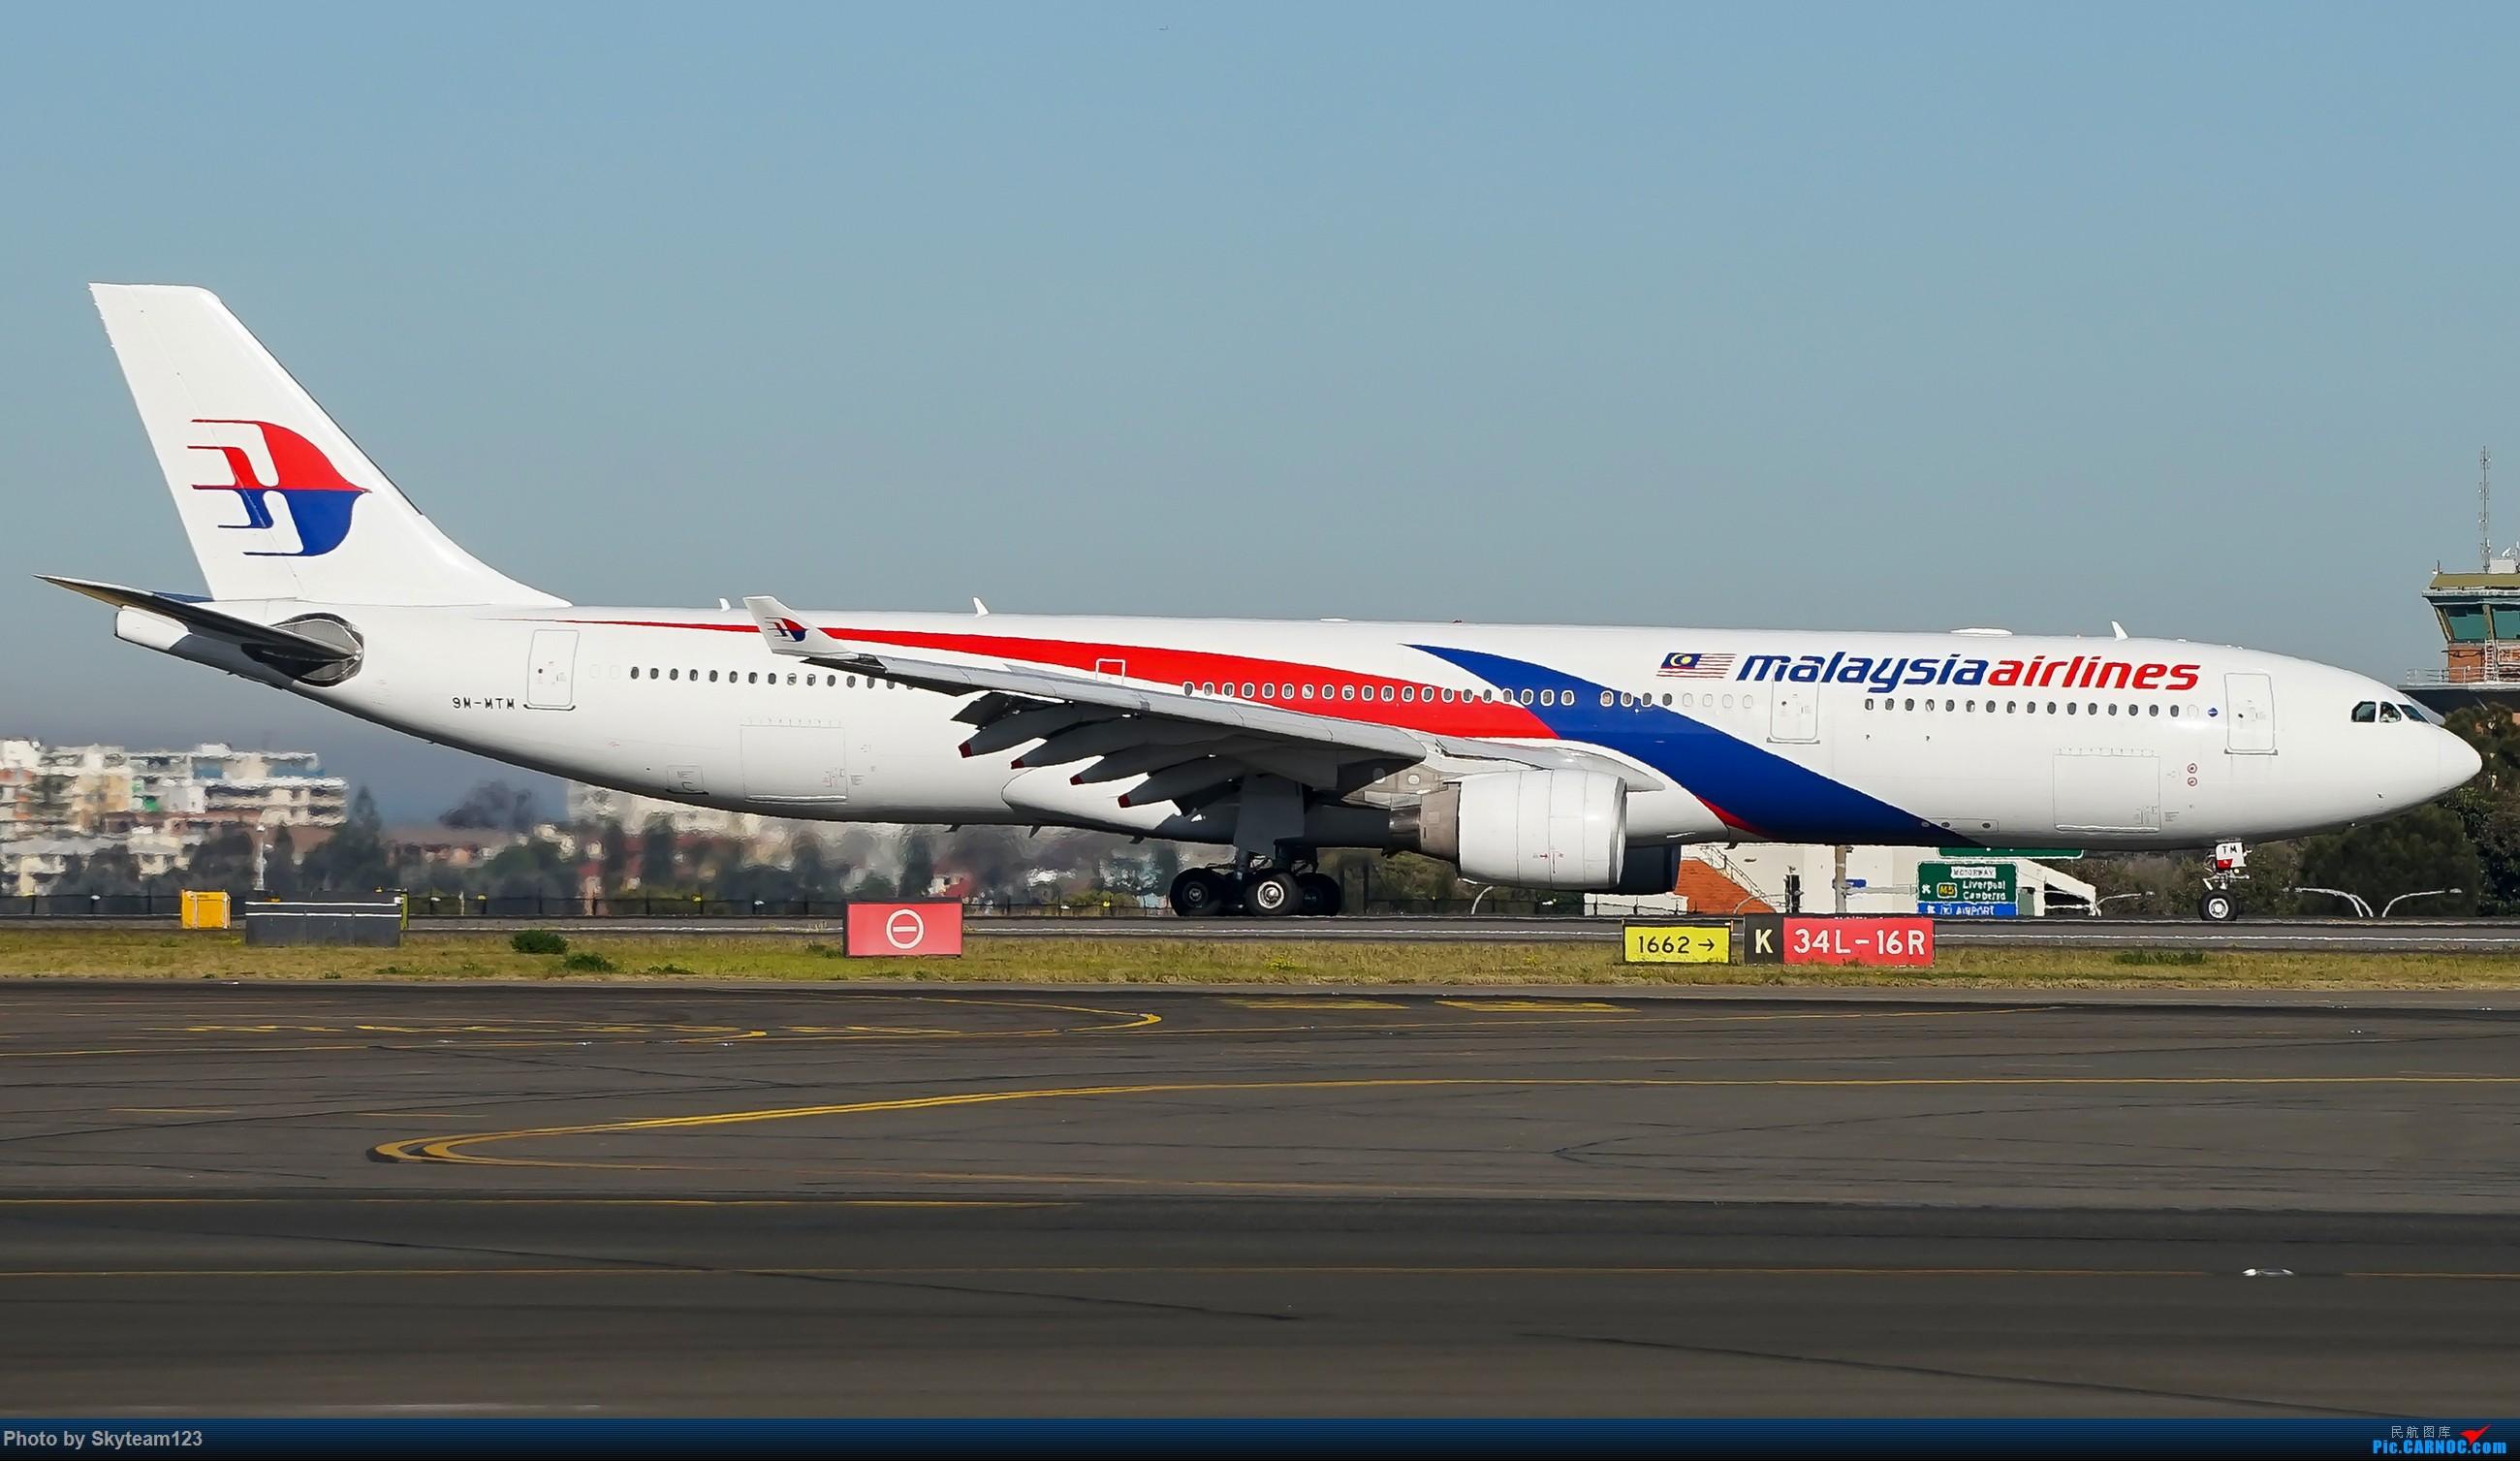 Re:[原创][SYD] 再访Blu EMU停车场 早上34L抵港出发杂图几张 AIRBUS A330-300 9M-MTM 澳大利亚悉尼金斯福德·史密斯机场